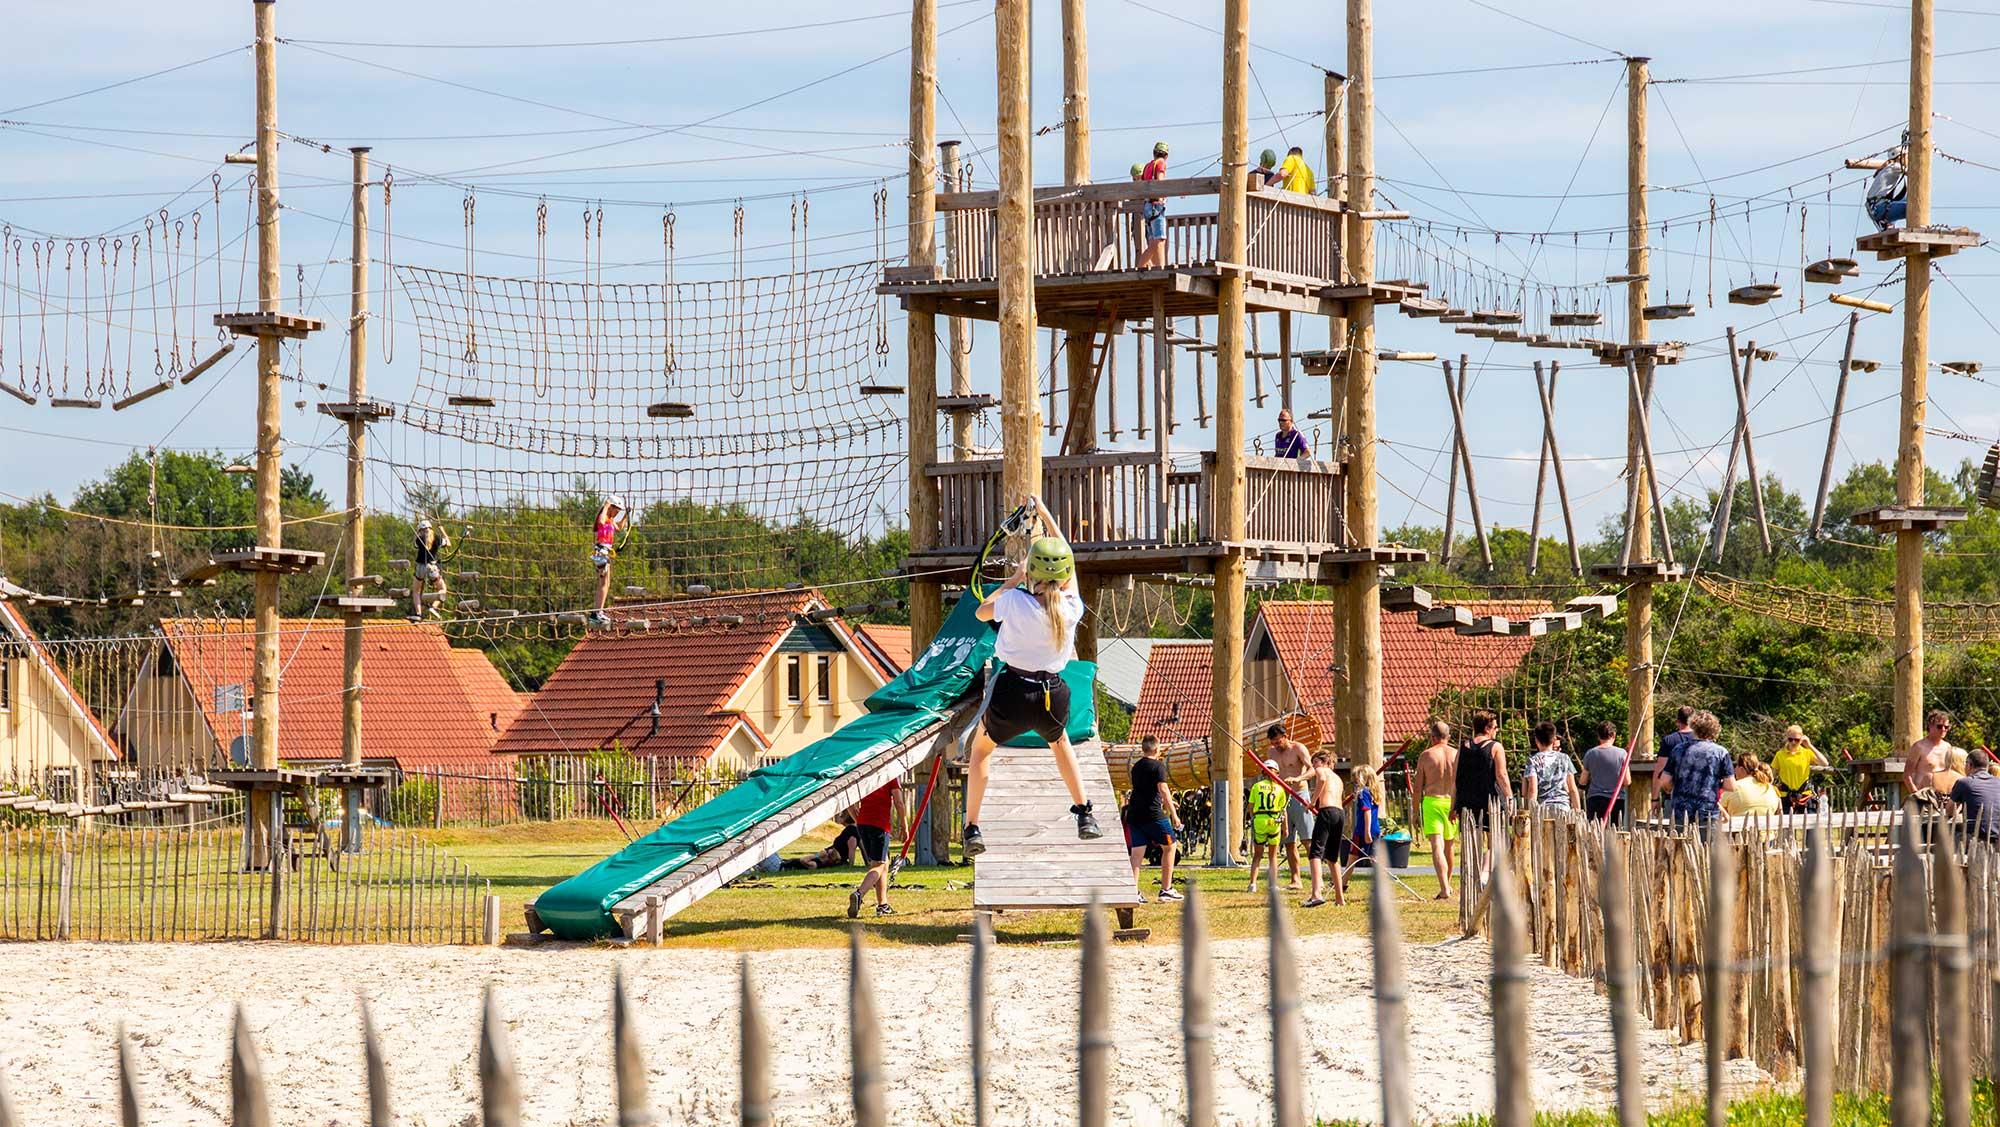 Parcoursen klimpark Molecaten Outdoor Drenthe 02